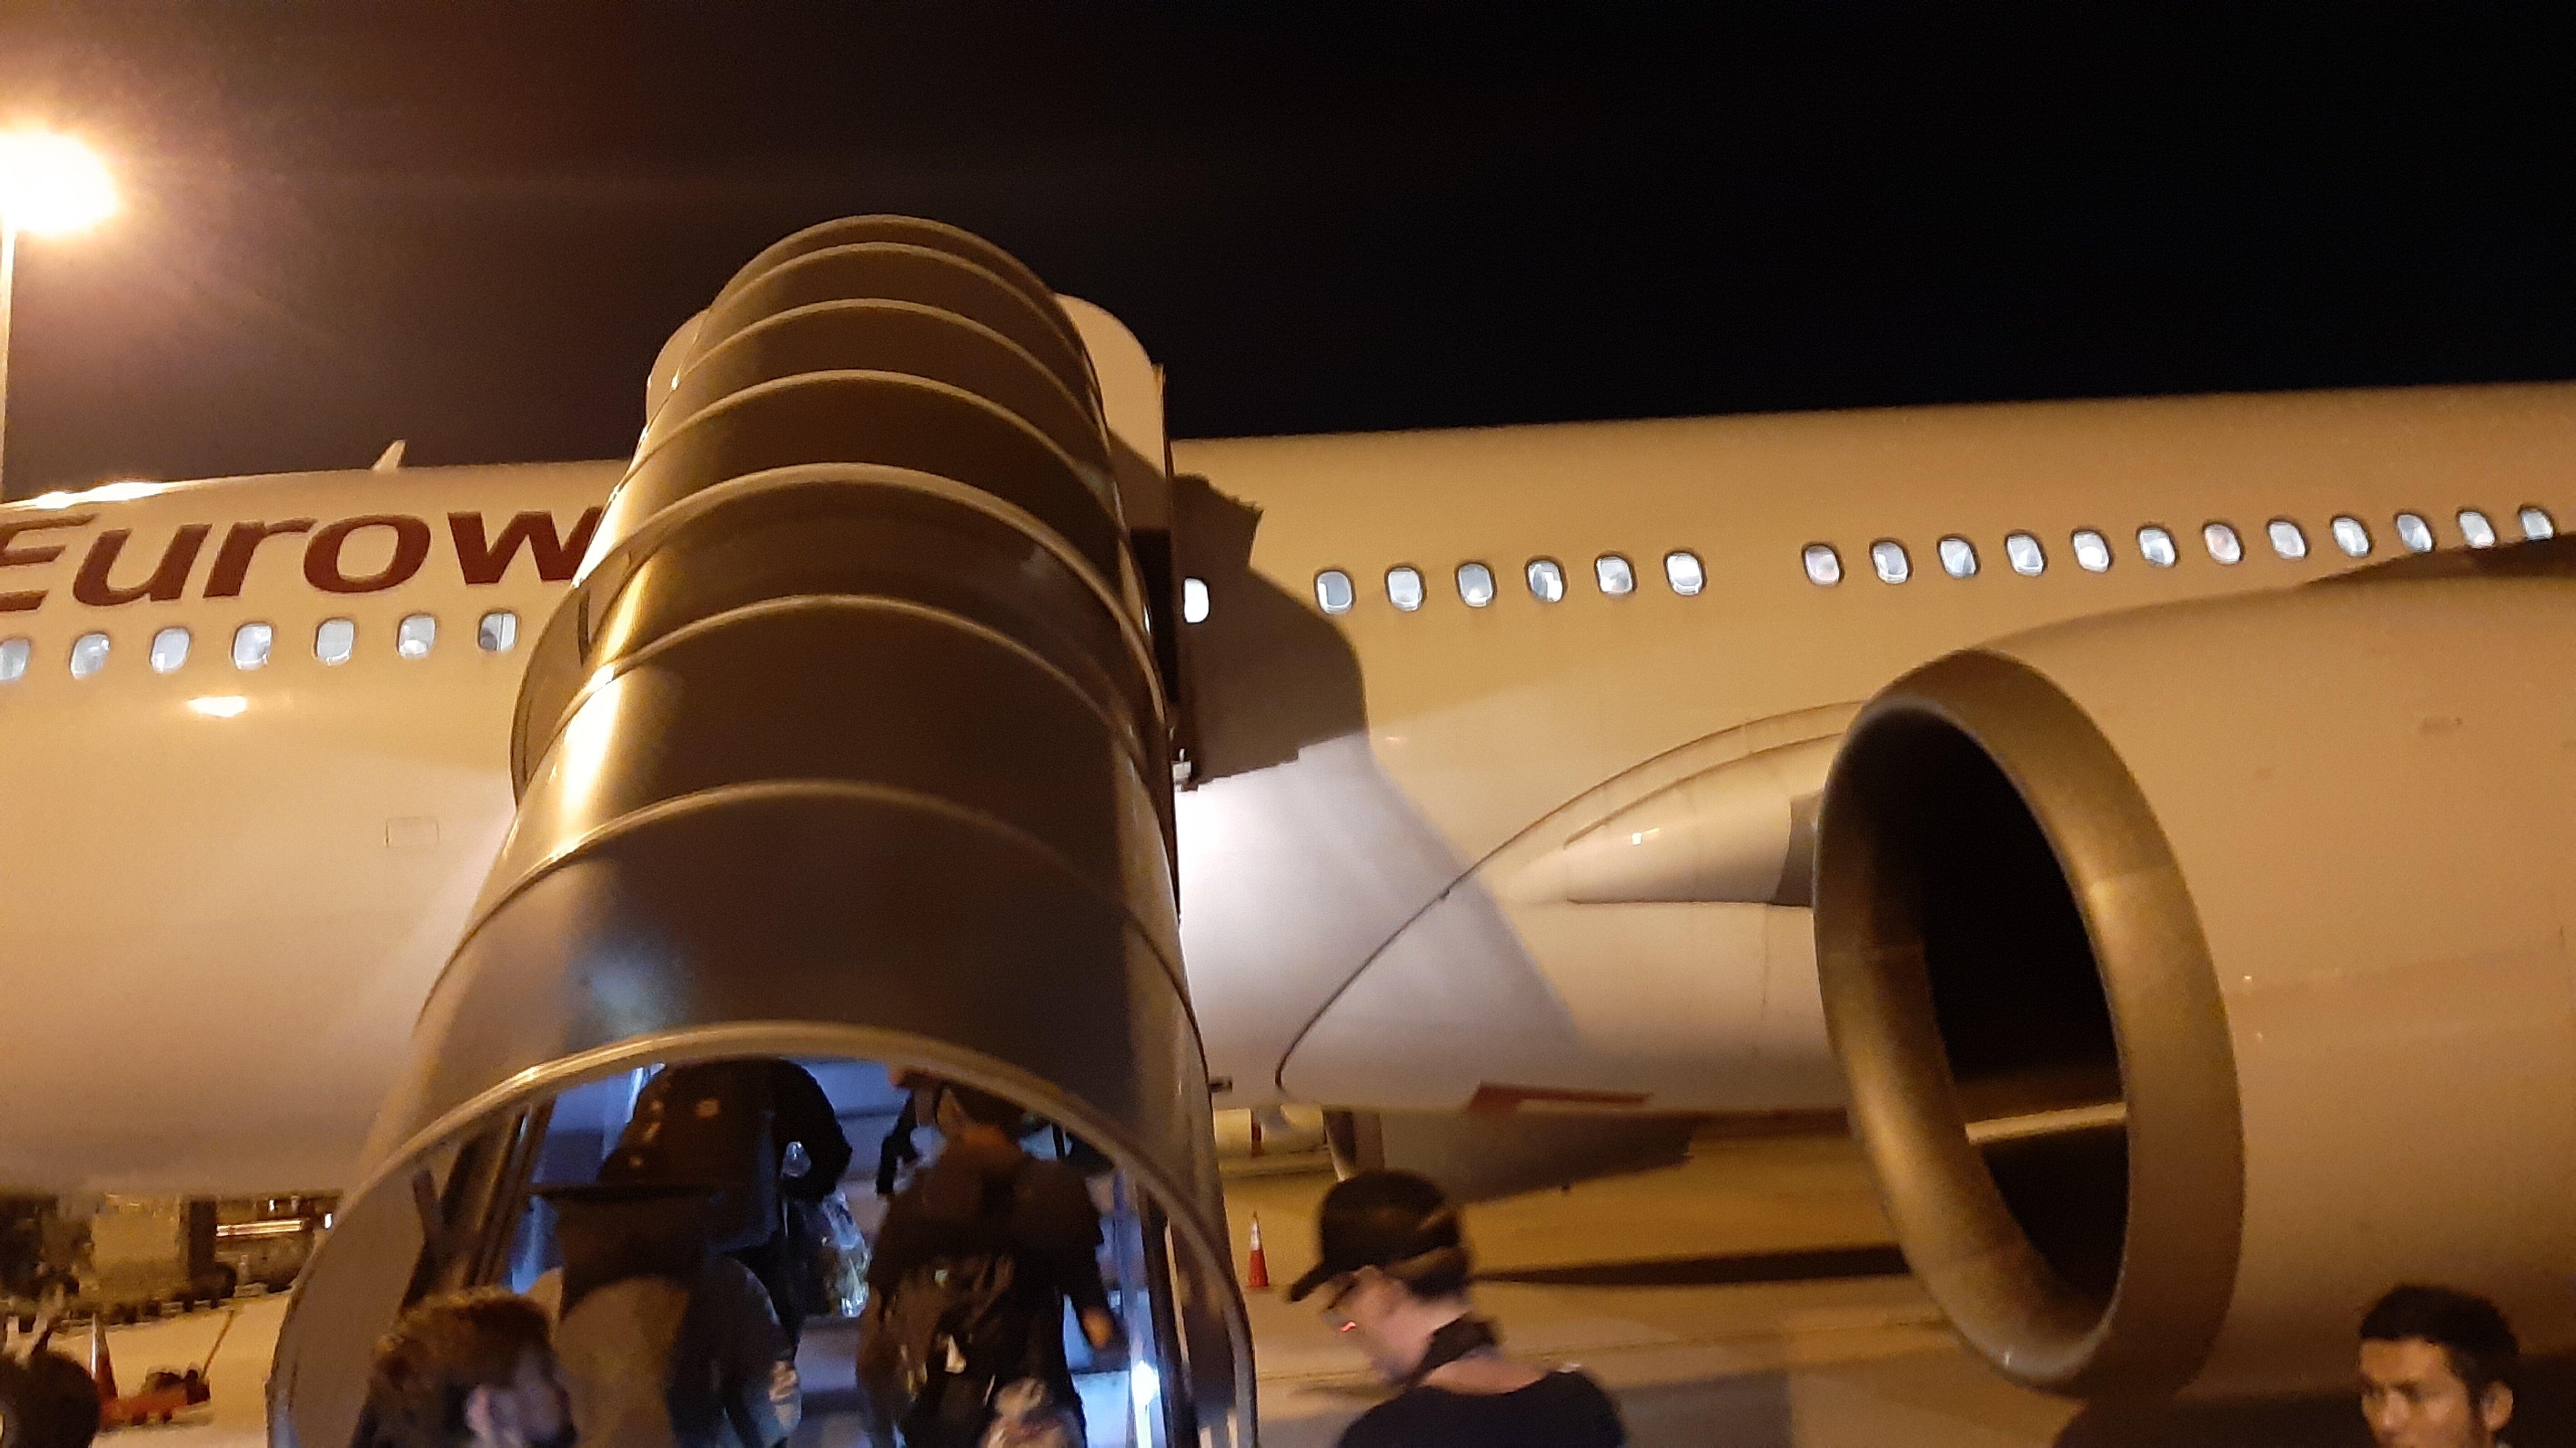 Boarding the Eurowings flight in Bangkok.